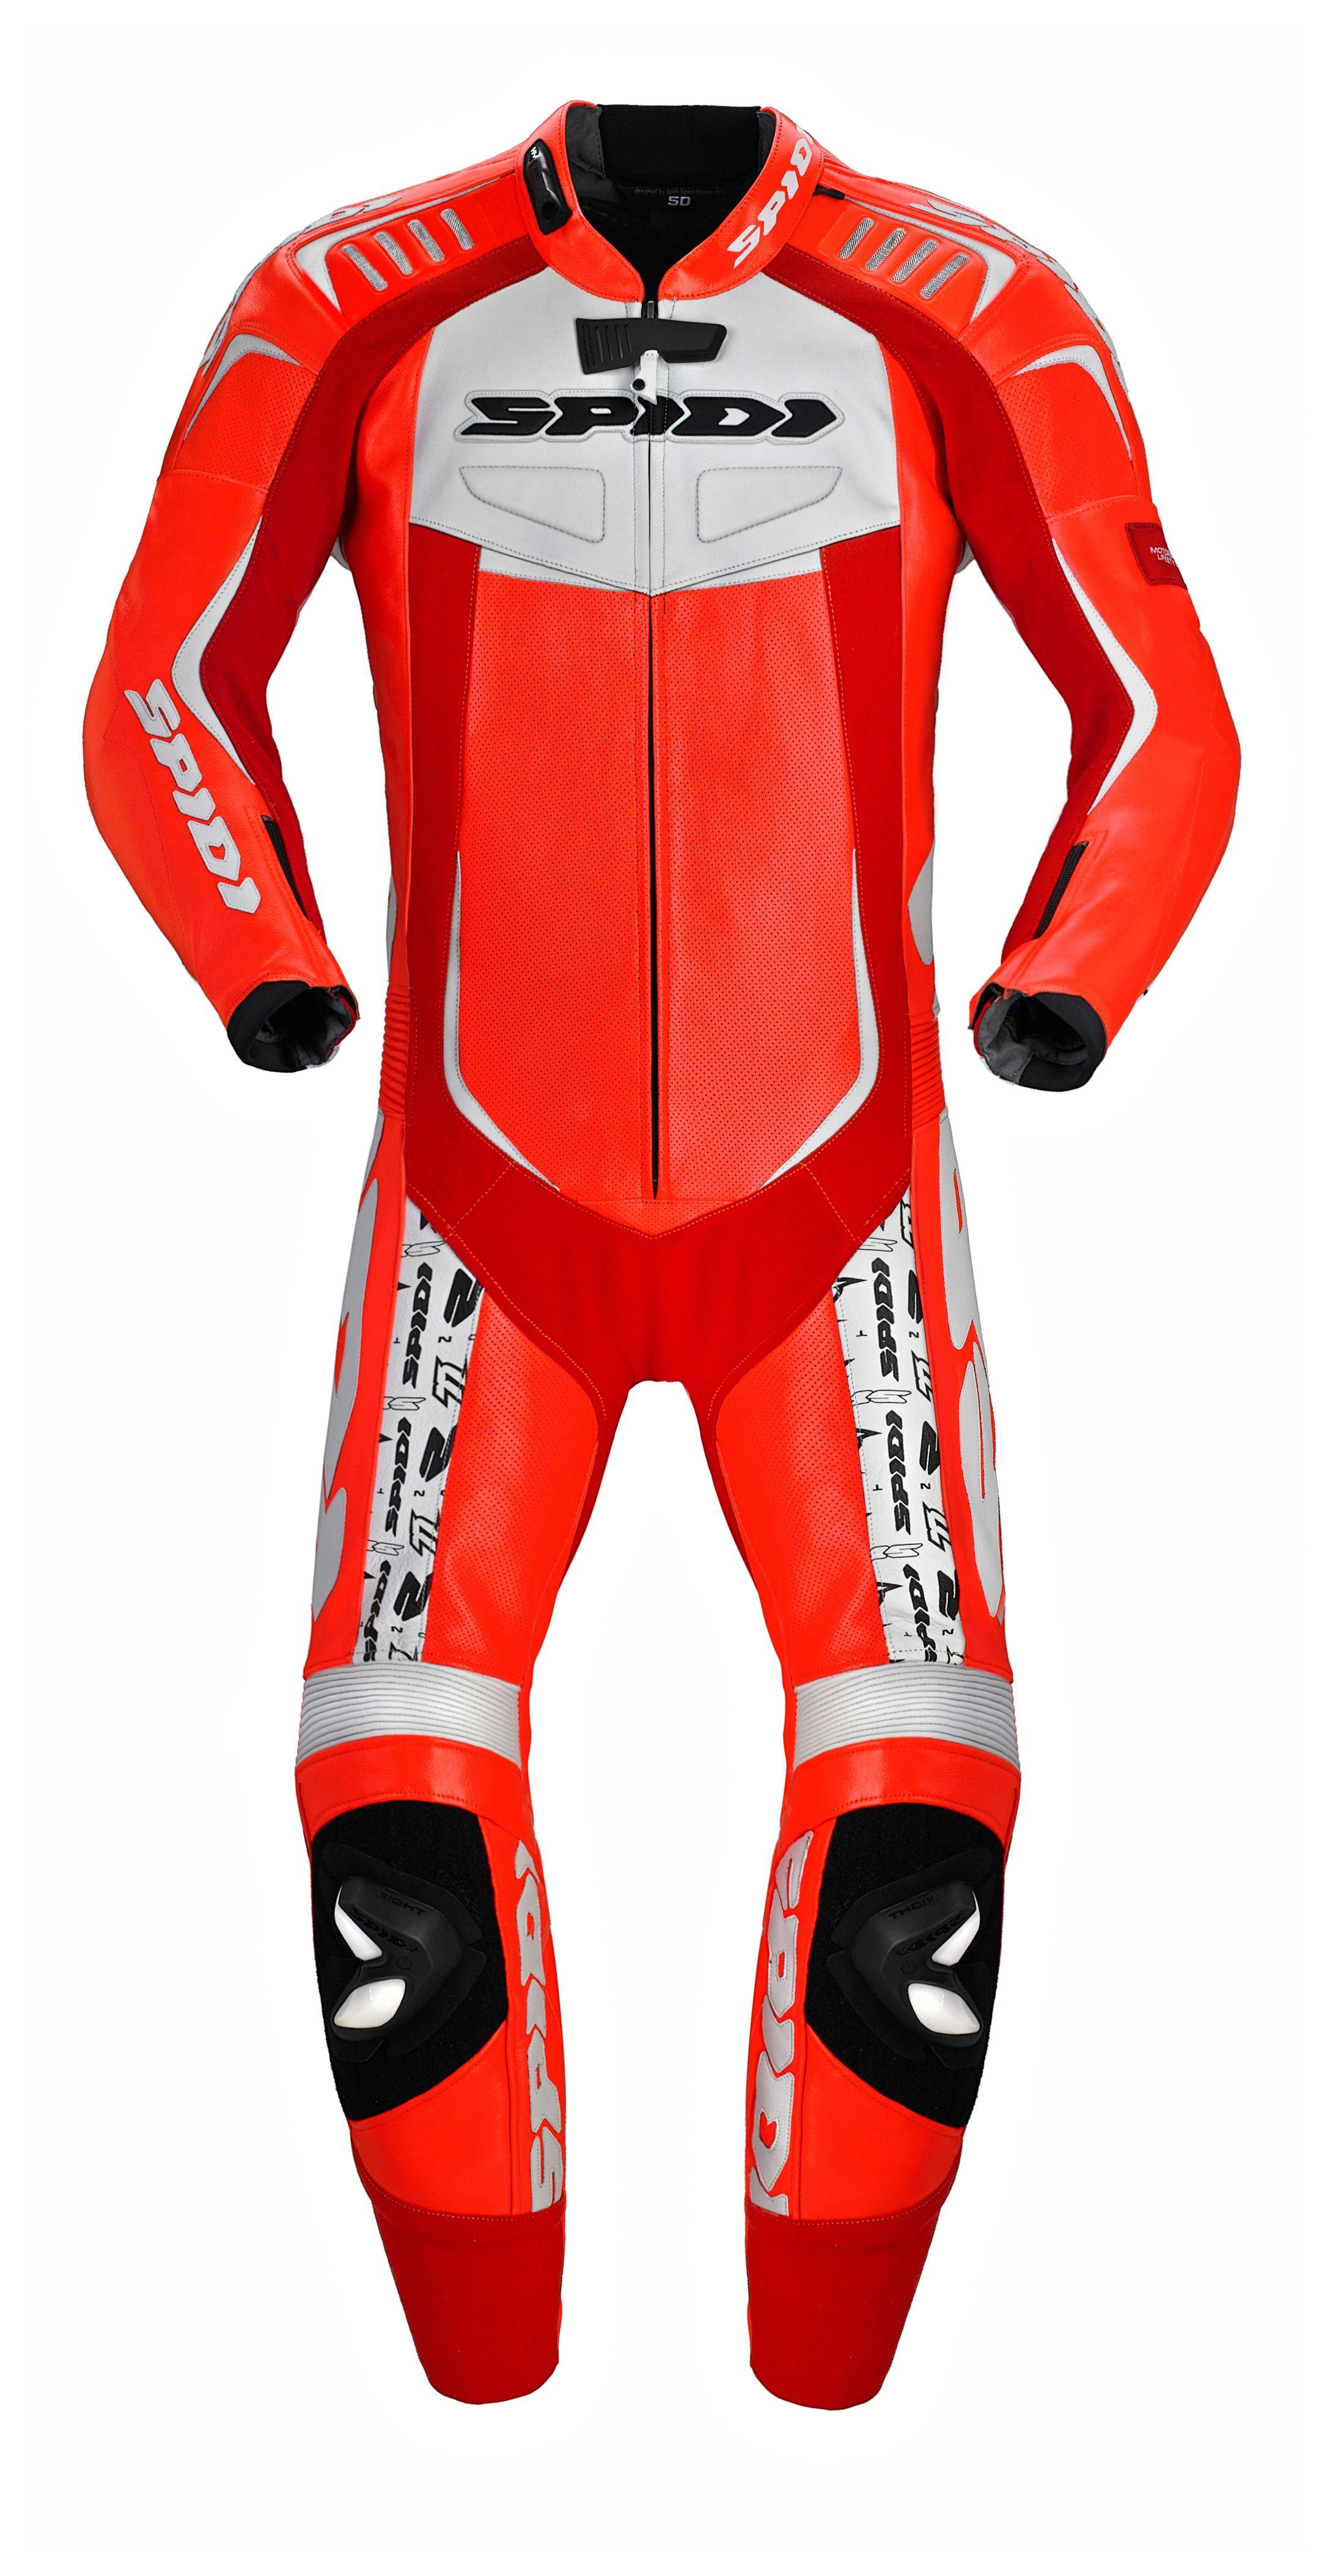 Spidi Track Wind Pro Replica Race Suit Sz 54 Only 15